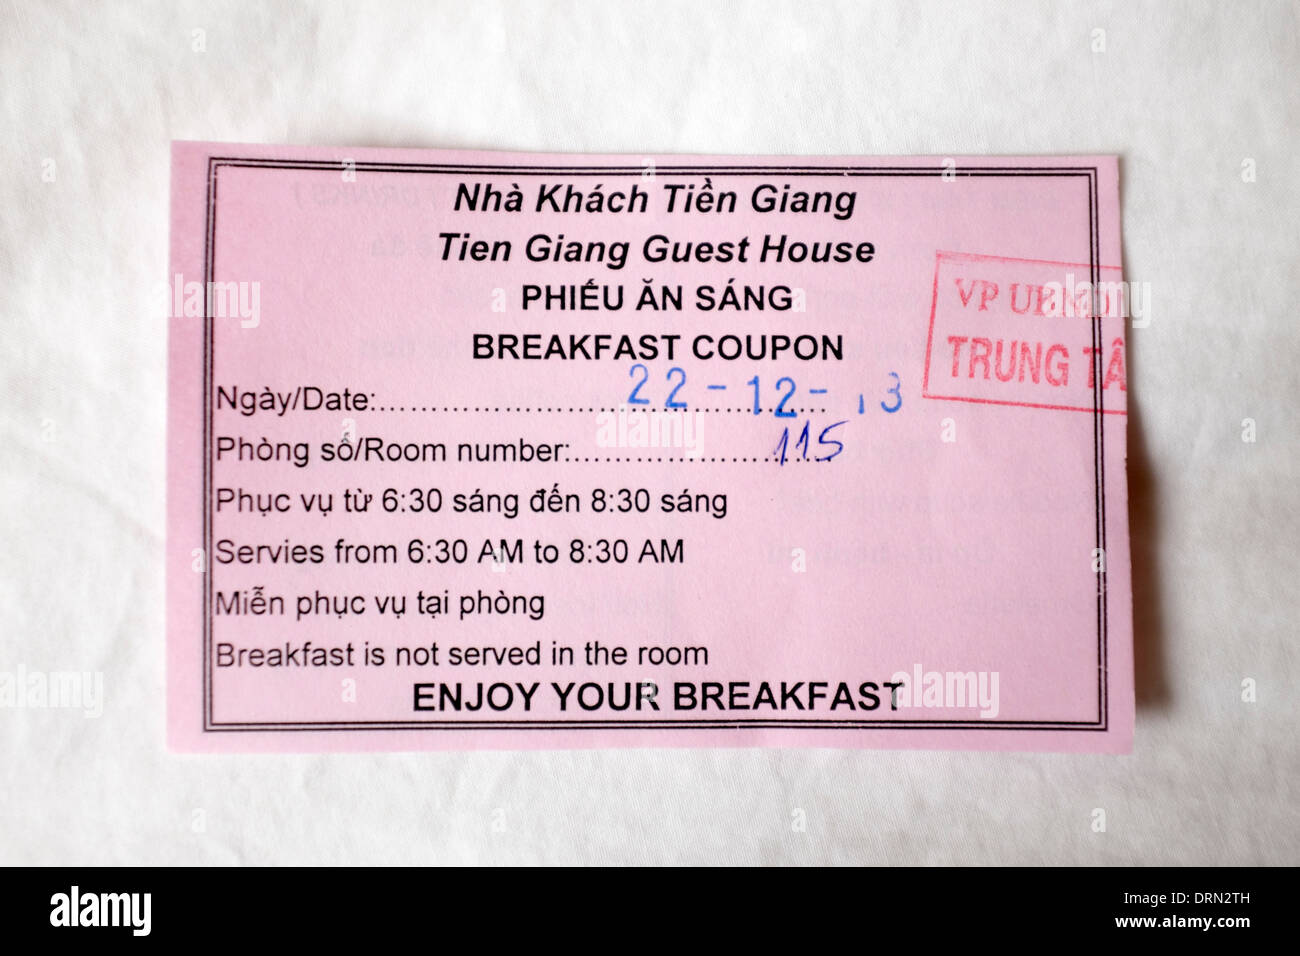 Vietnamese Hotel Breakfast Coupon Stock Photo 66231441 Alamy